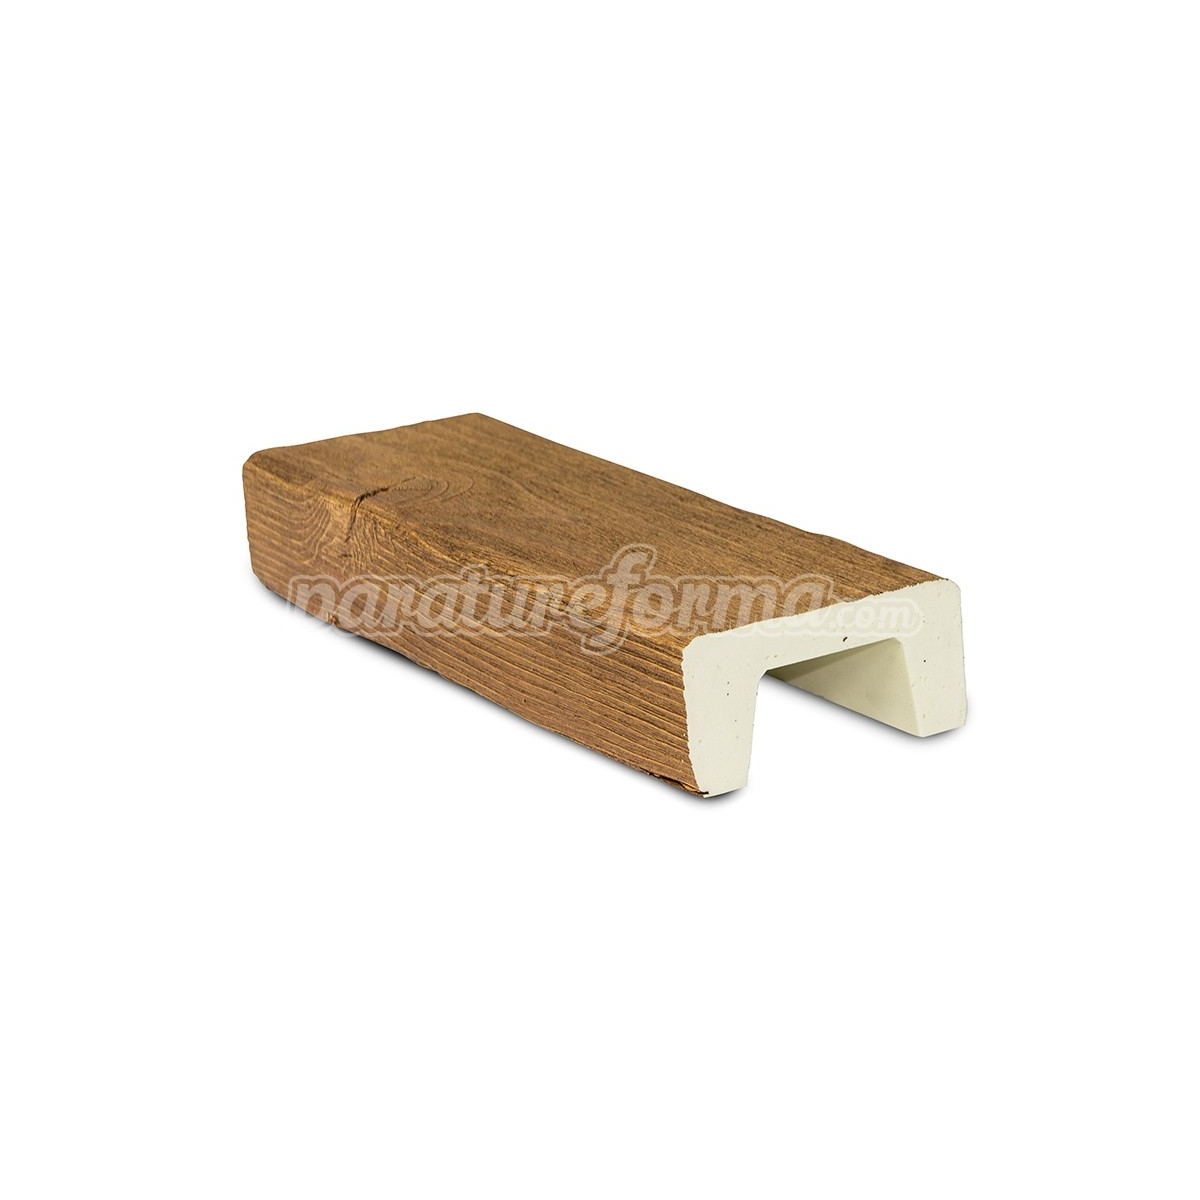 Viga imitación a madera de poliuretano - Vigas imitación madera cuadradas